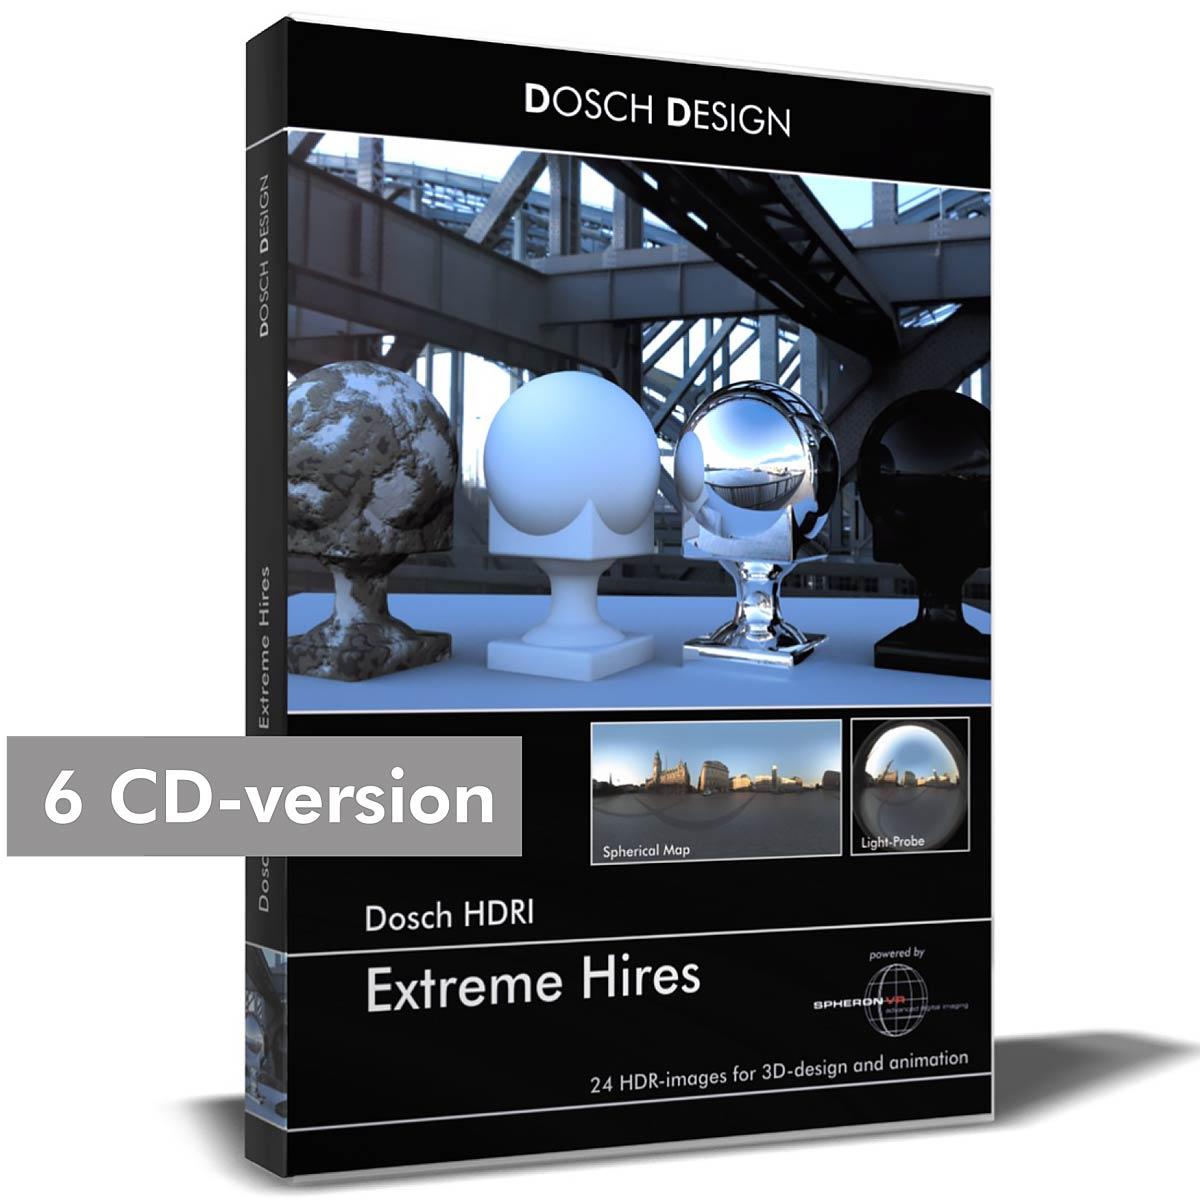 Download DOSCH design Extreme Hires hdri